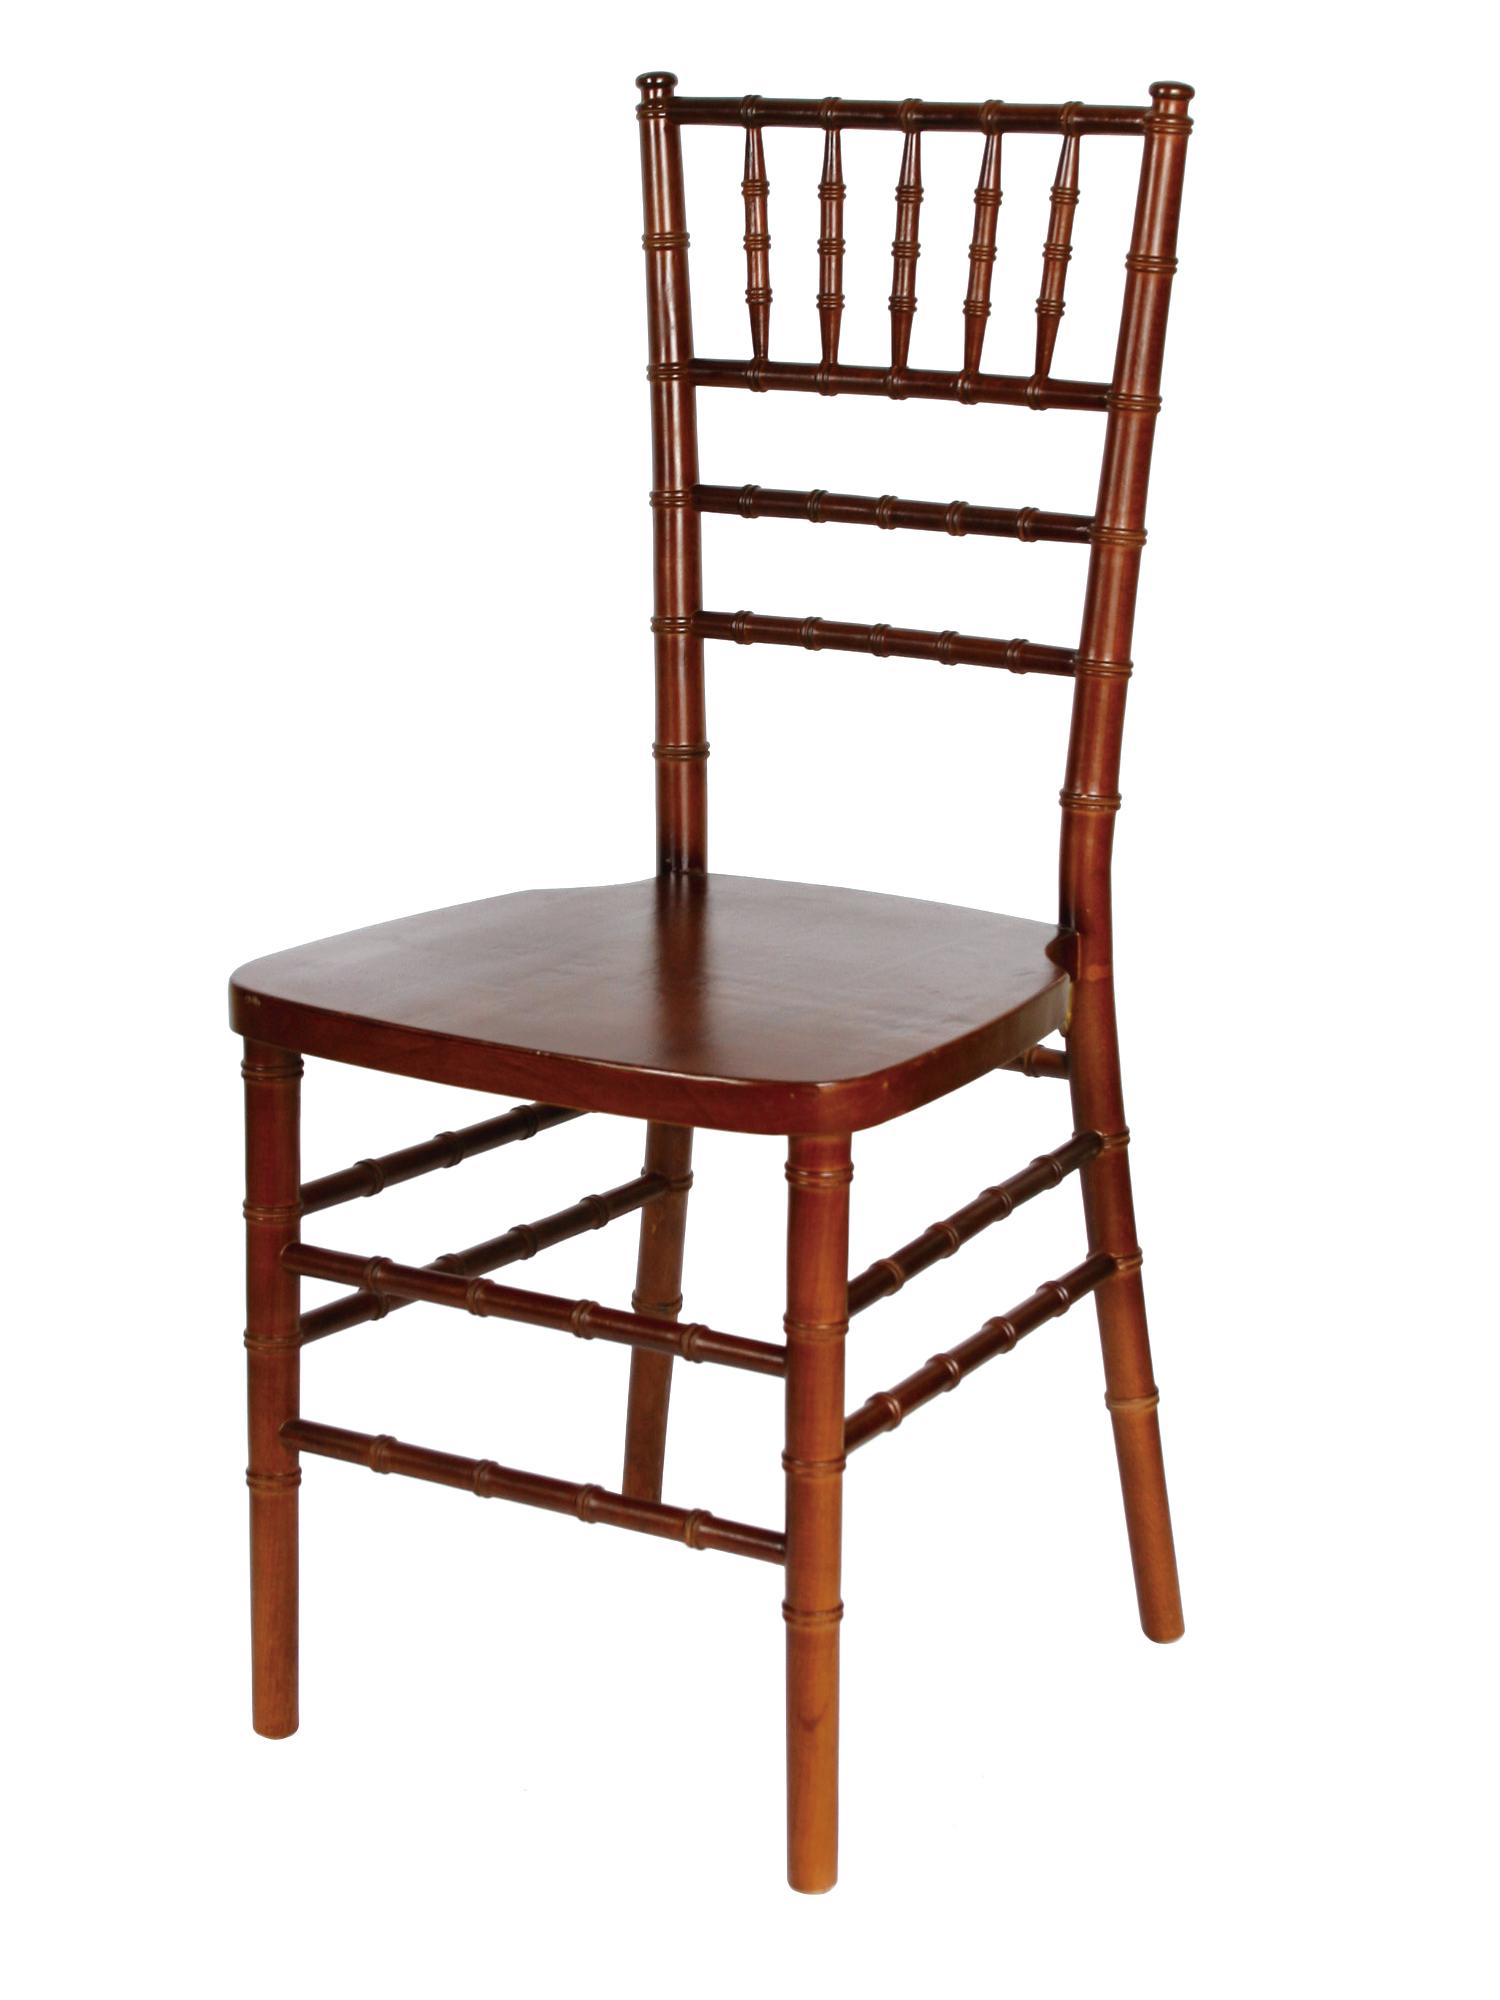 inspirational fruitwood folding chairs lovely | inmunoanalisis